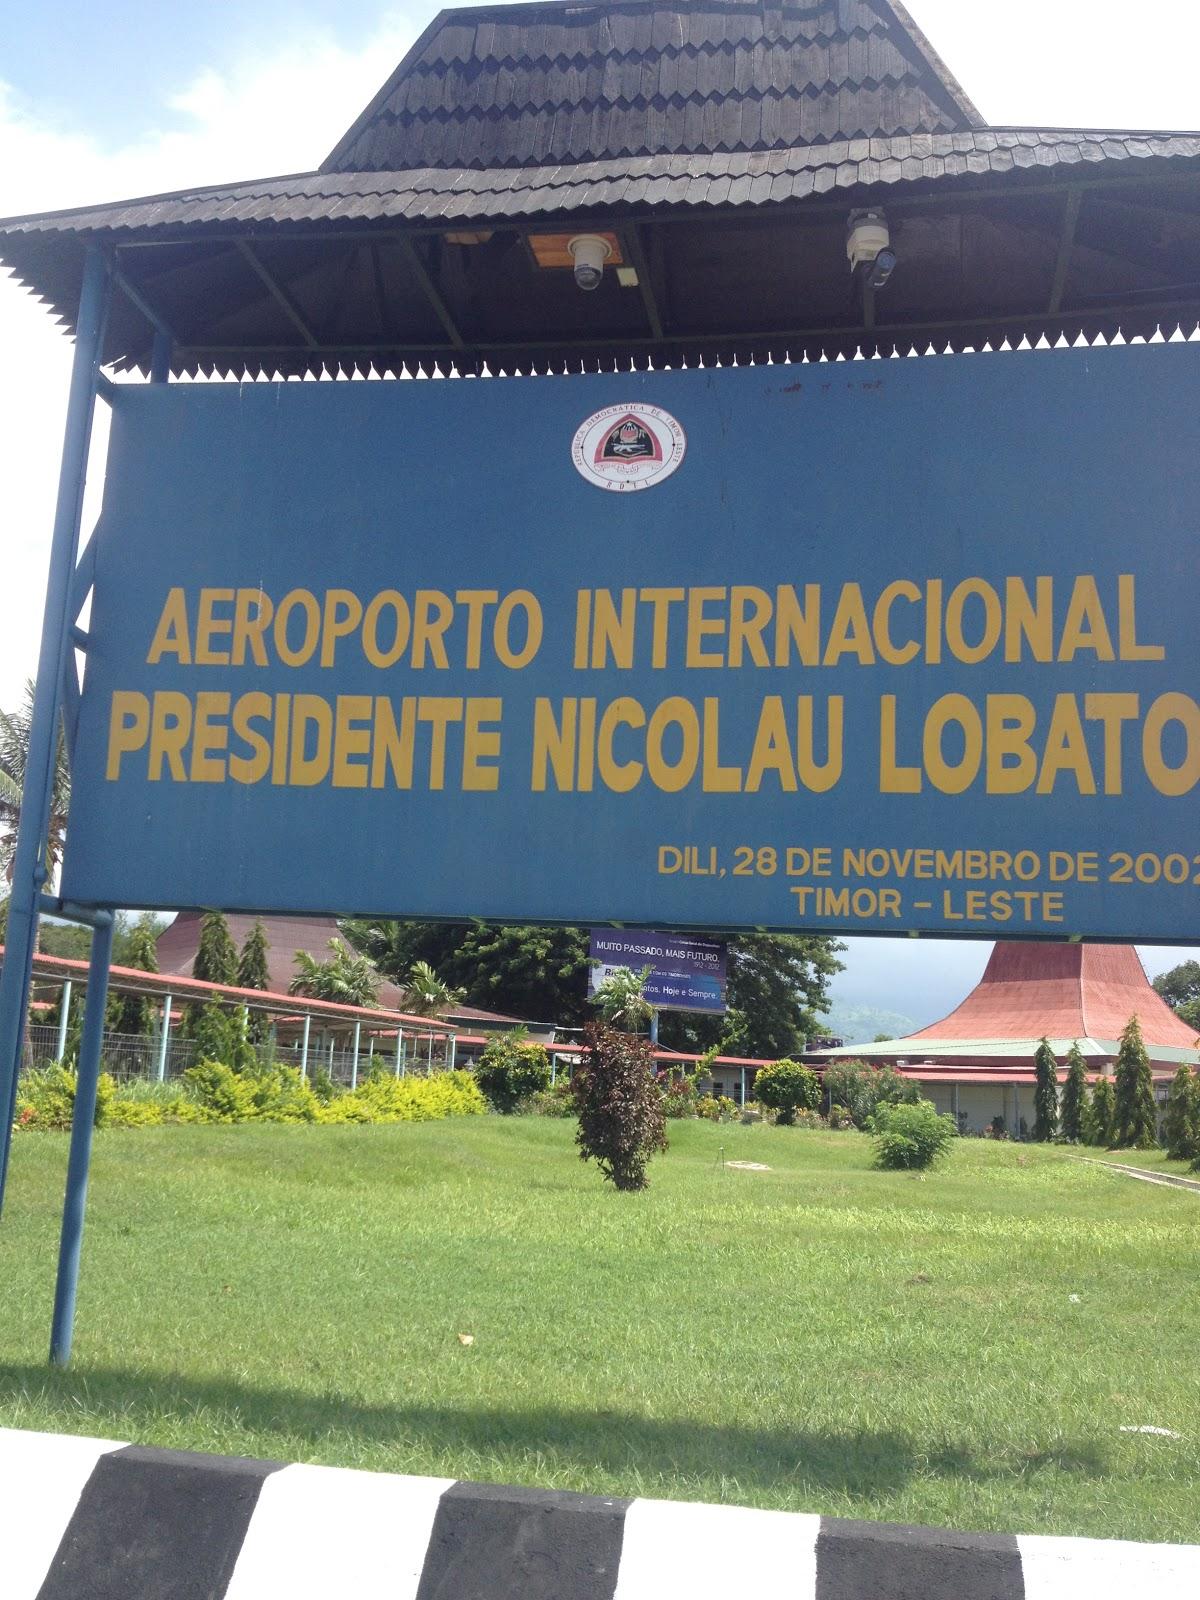 Aeroporto Dili : Dean in dili: adventures in east timor: dili